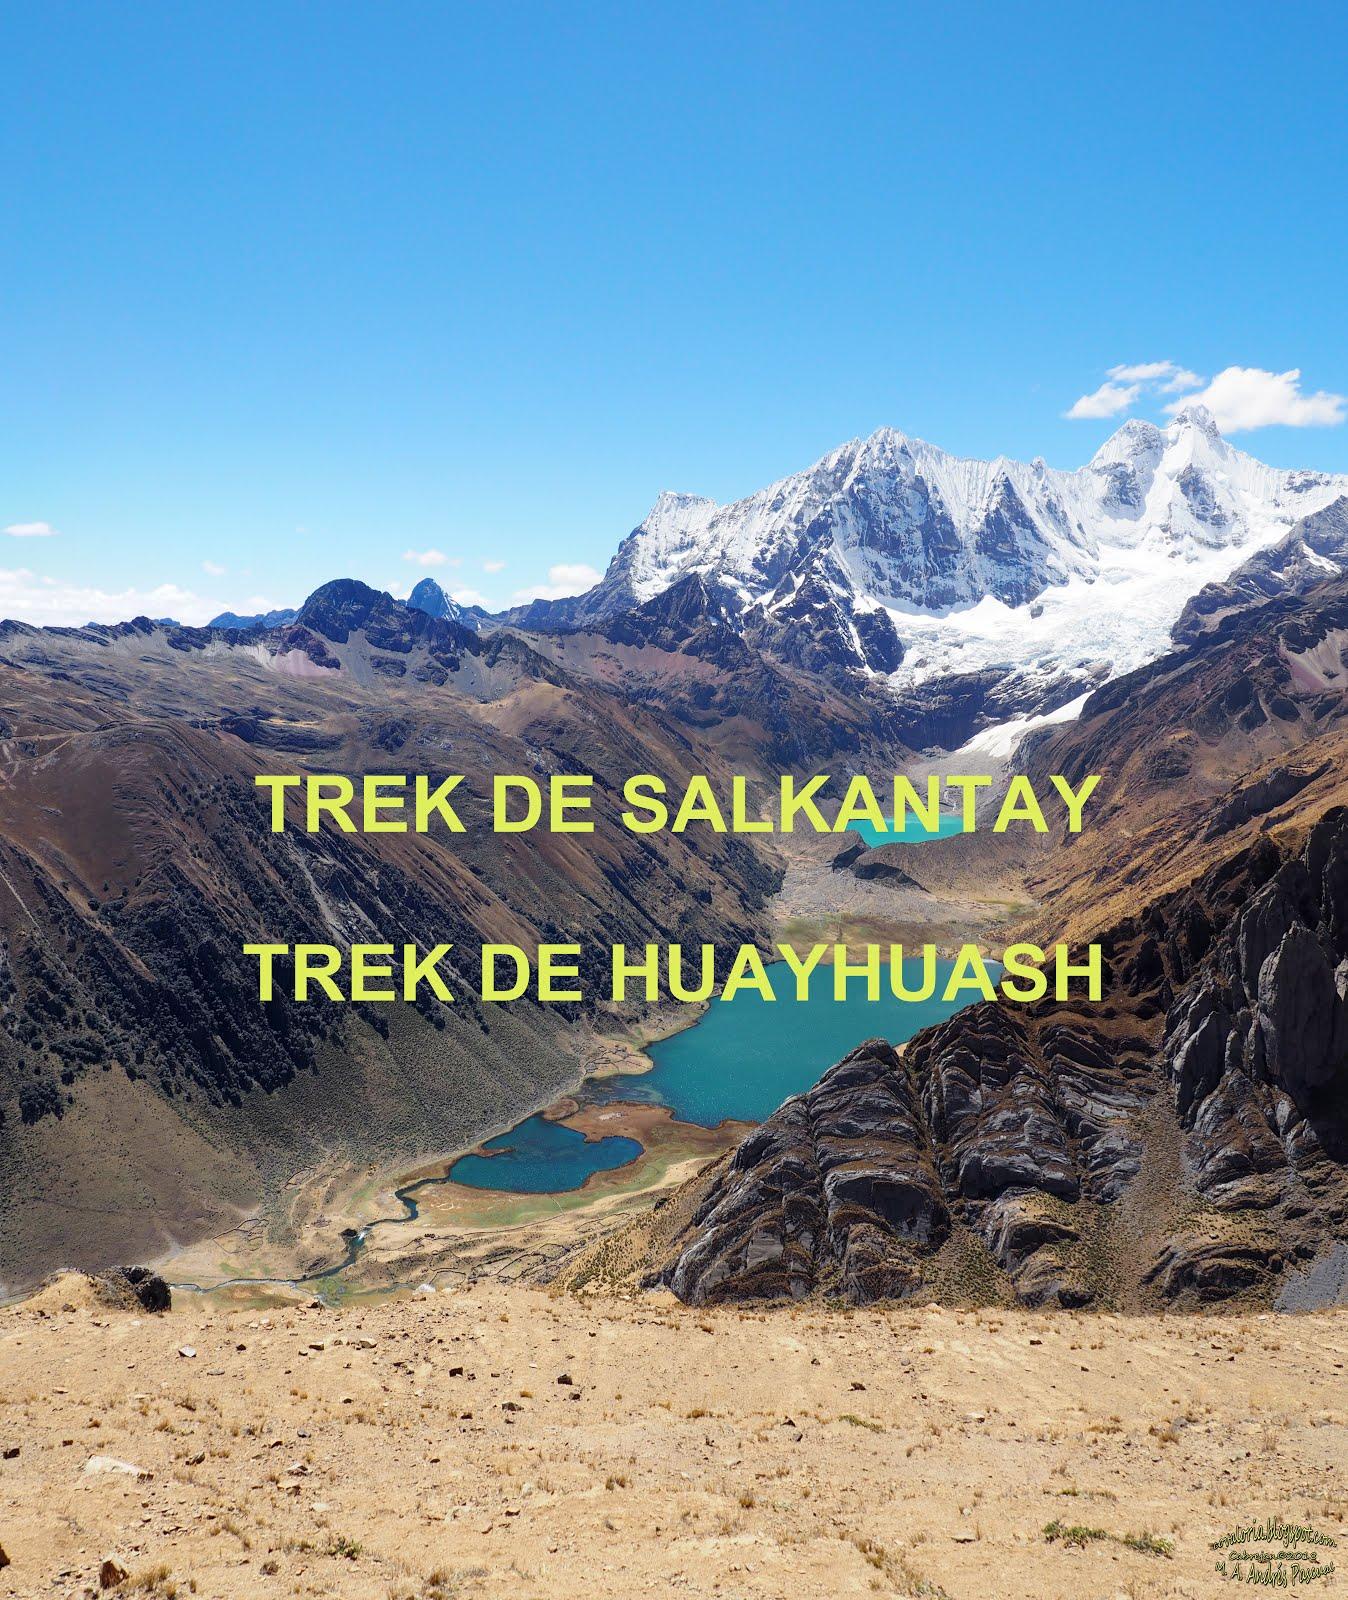 Perú. Salkanty / Huayhuash